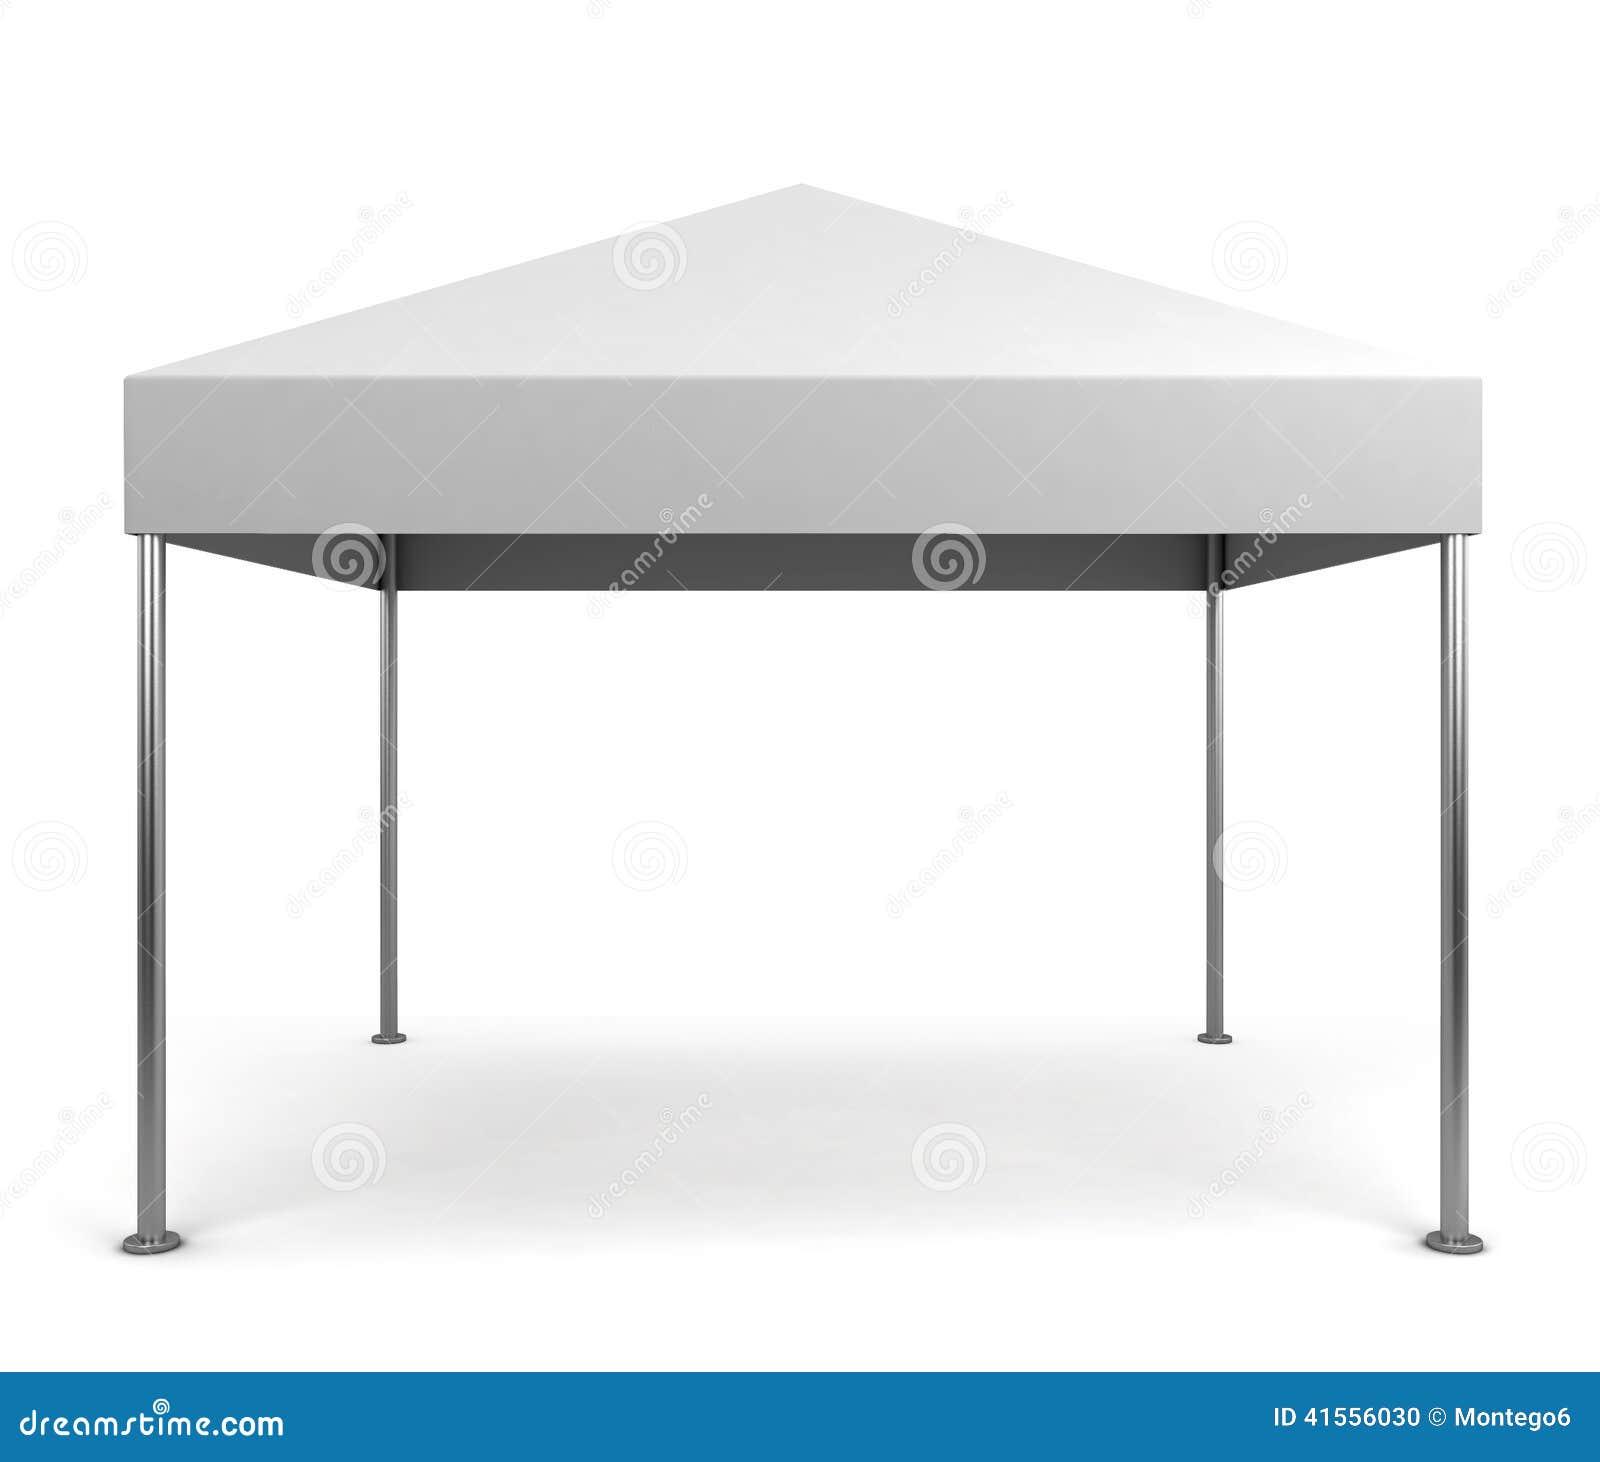 Canopy Tent Stock Illustration Image 41556030